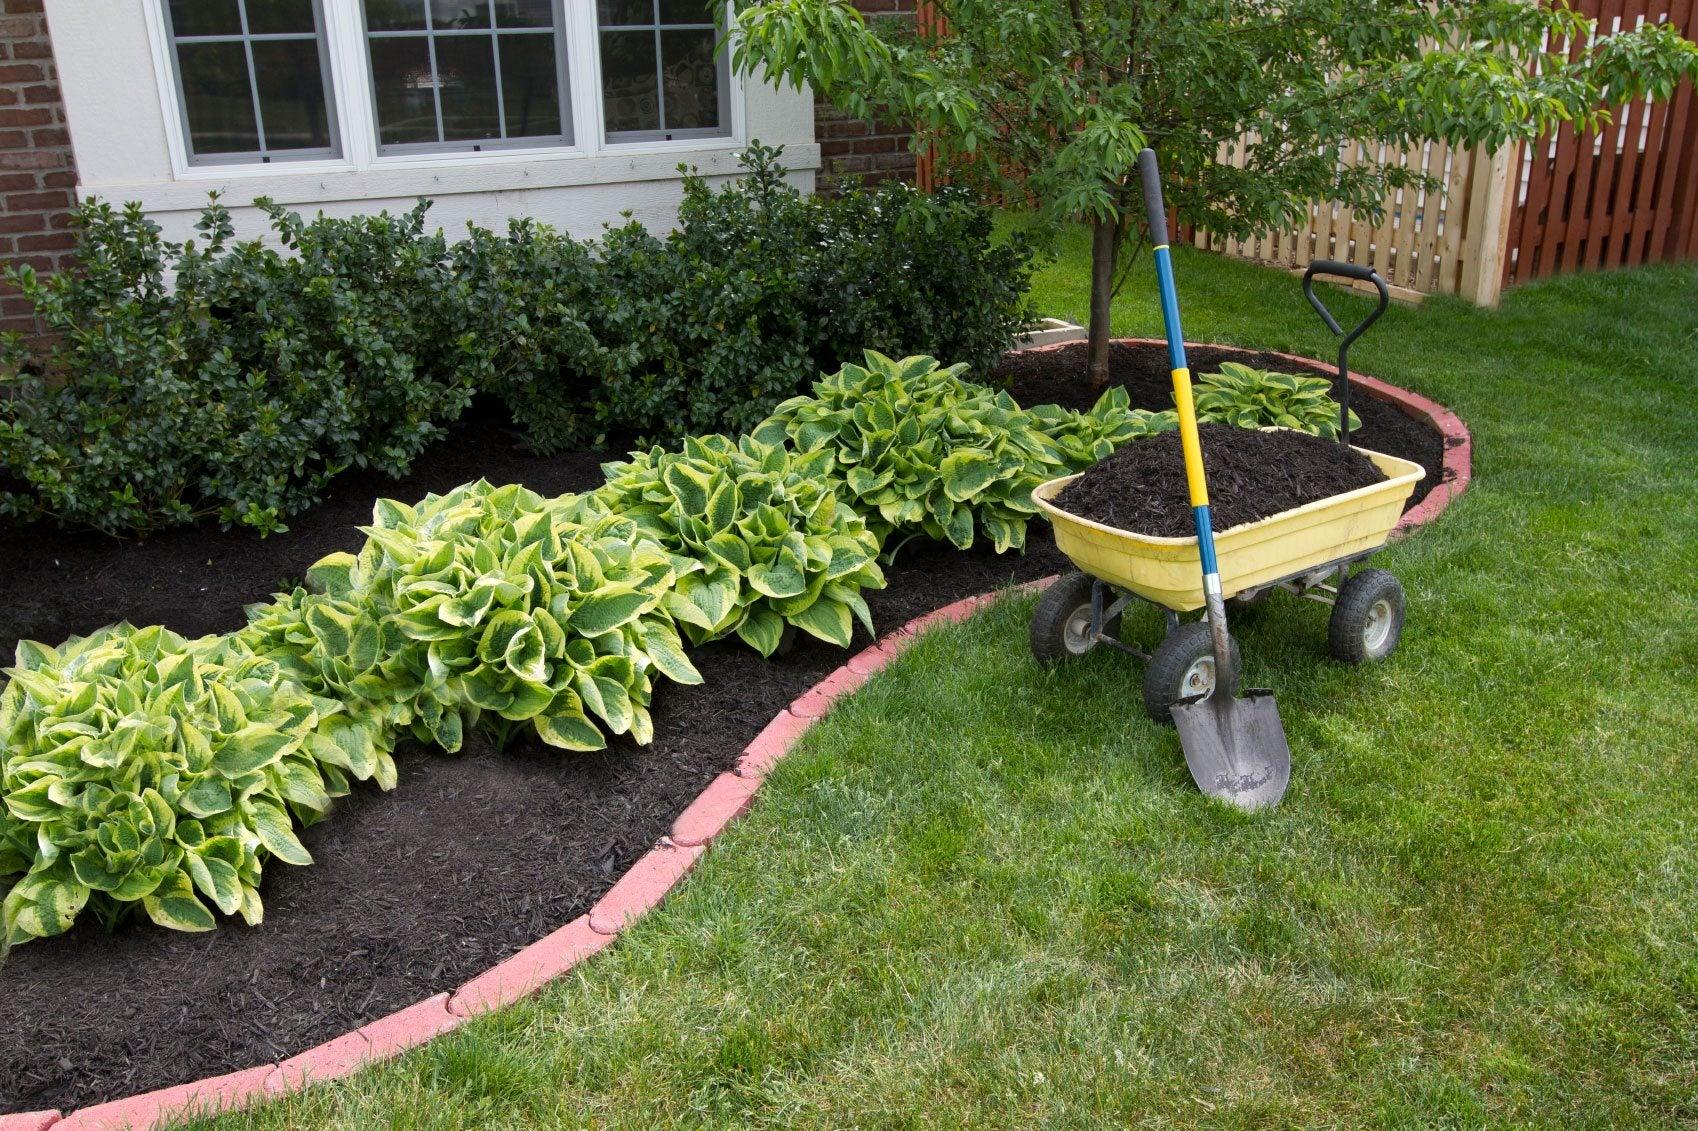 Mulch Selection Info - Choosing Mulch For Gardens